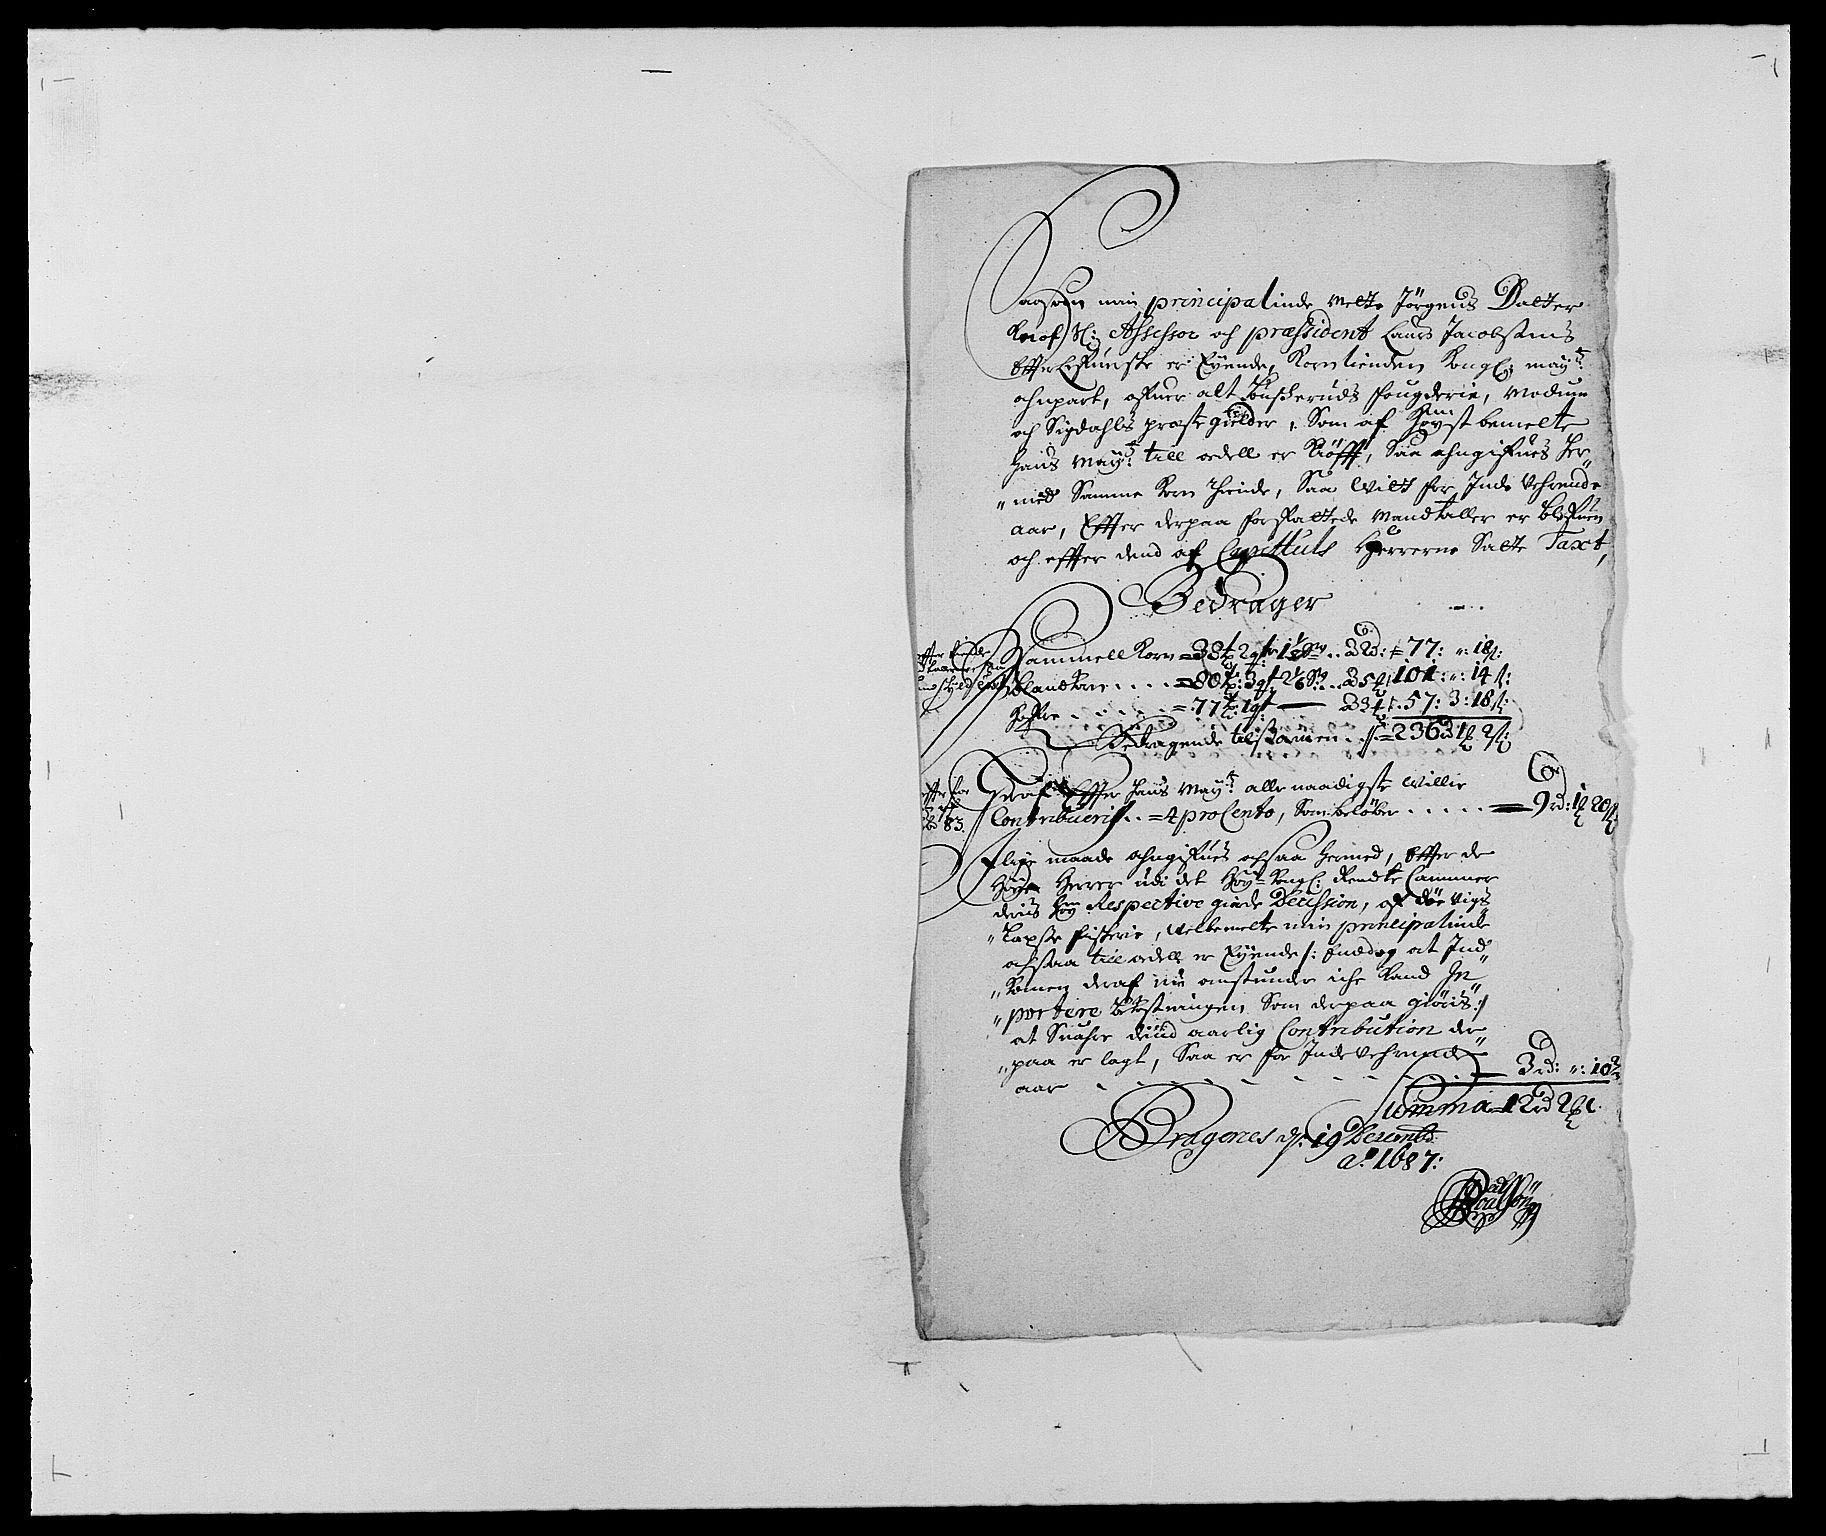 RA, Rentekammeret inntil 1814, Reviderte regnskaper, Fogderegnskap, R25/L1679: Fogderegnskap Buskerud, 1687-1688, s. 66